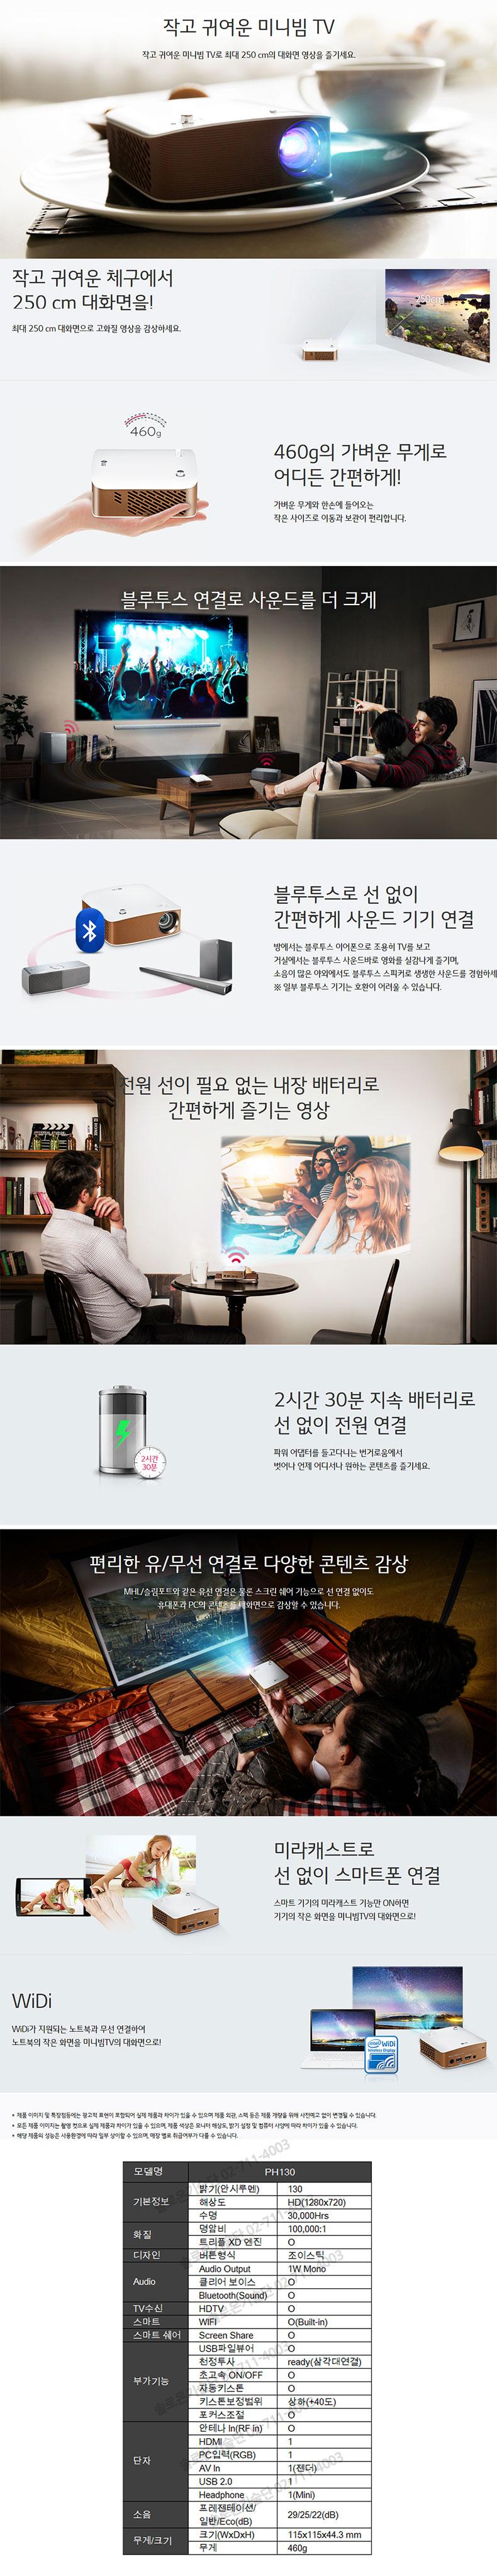 LG 미니빔 PH130 HD 프로젝터